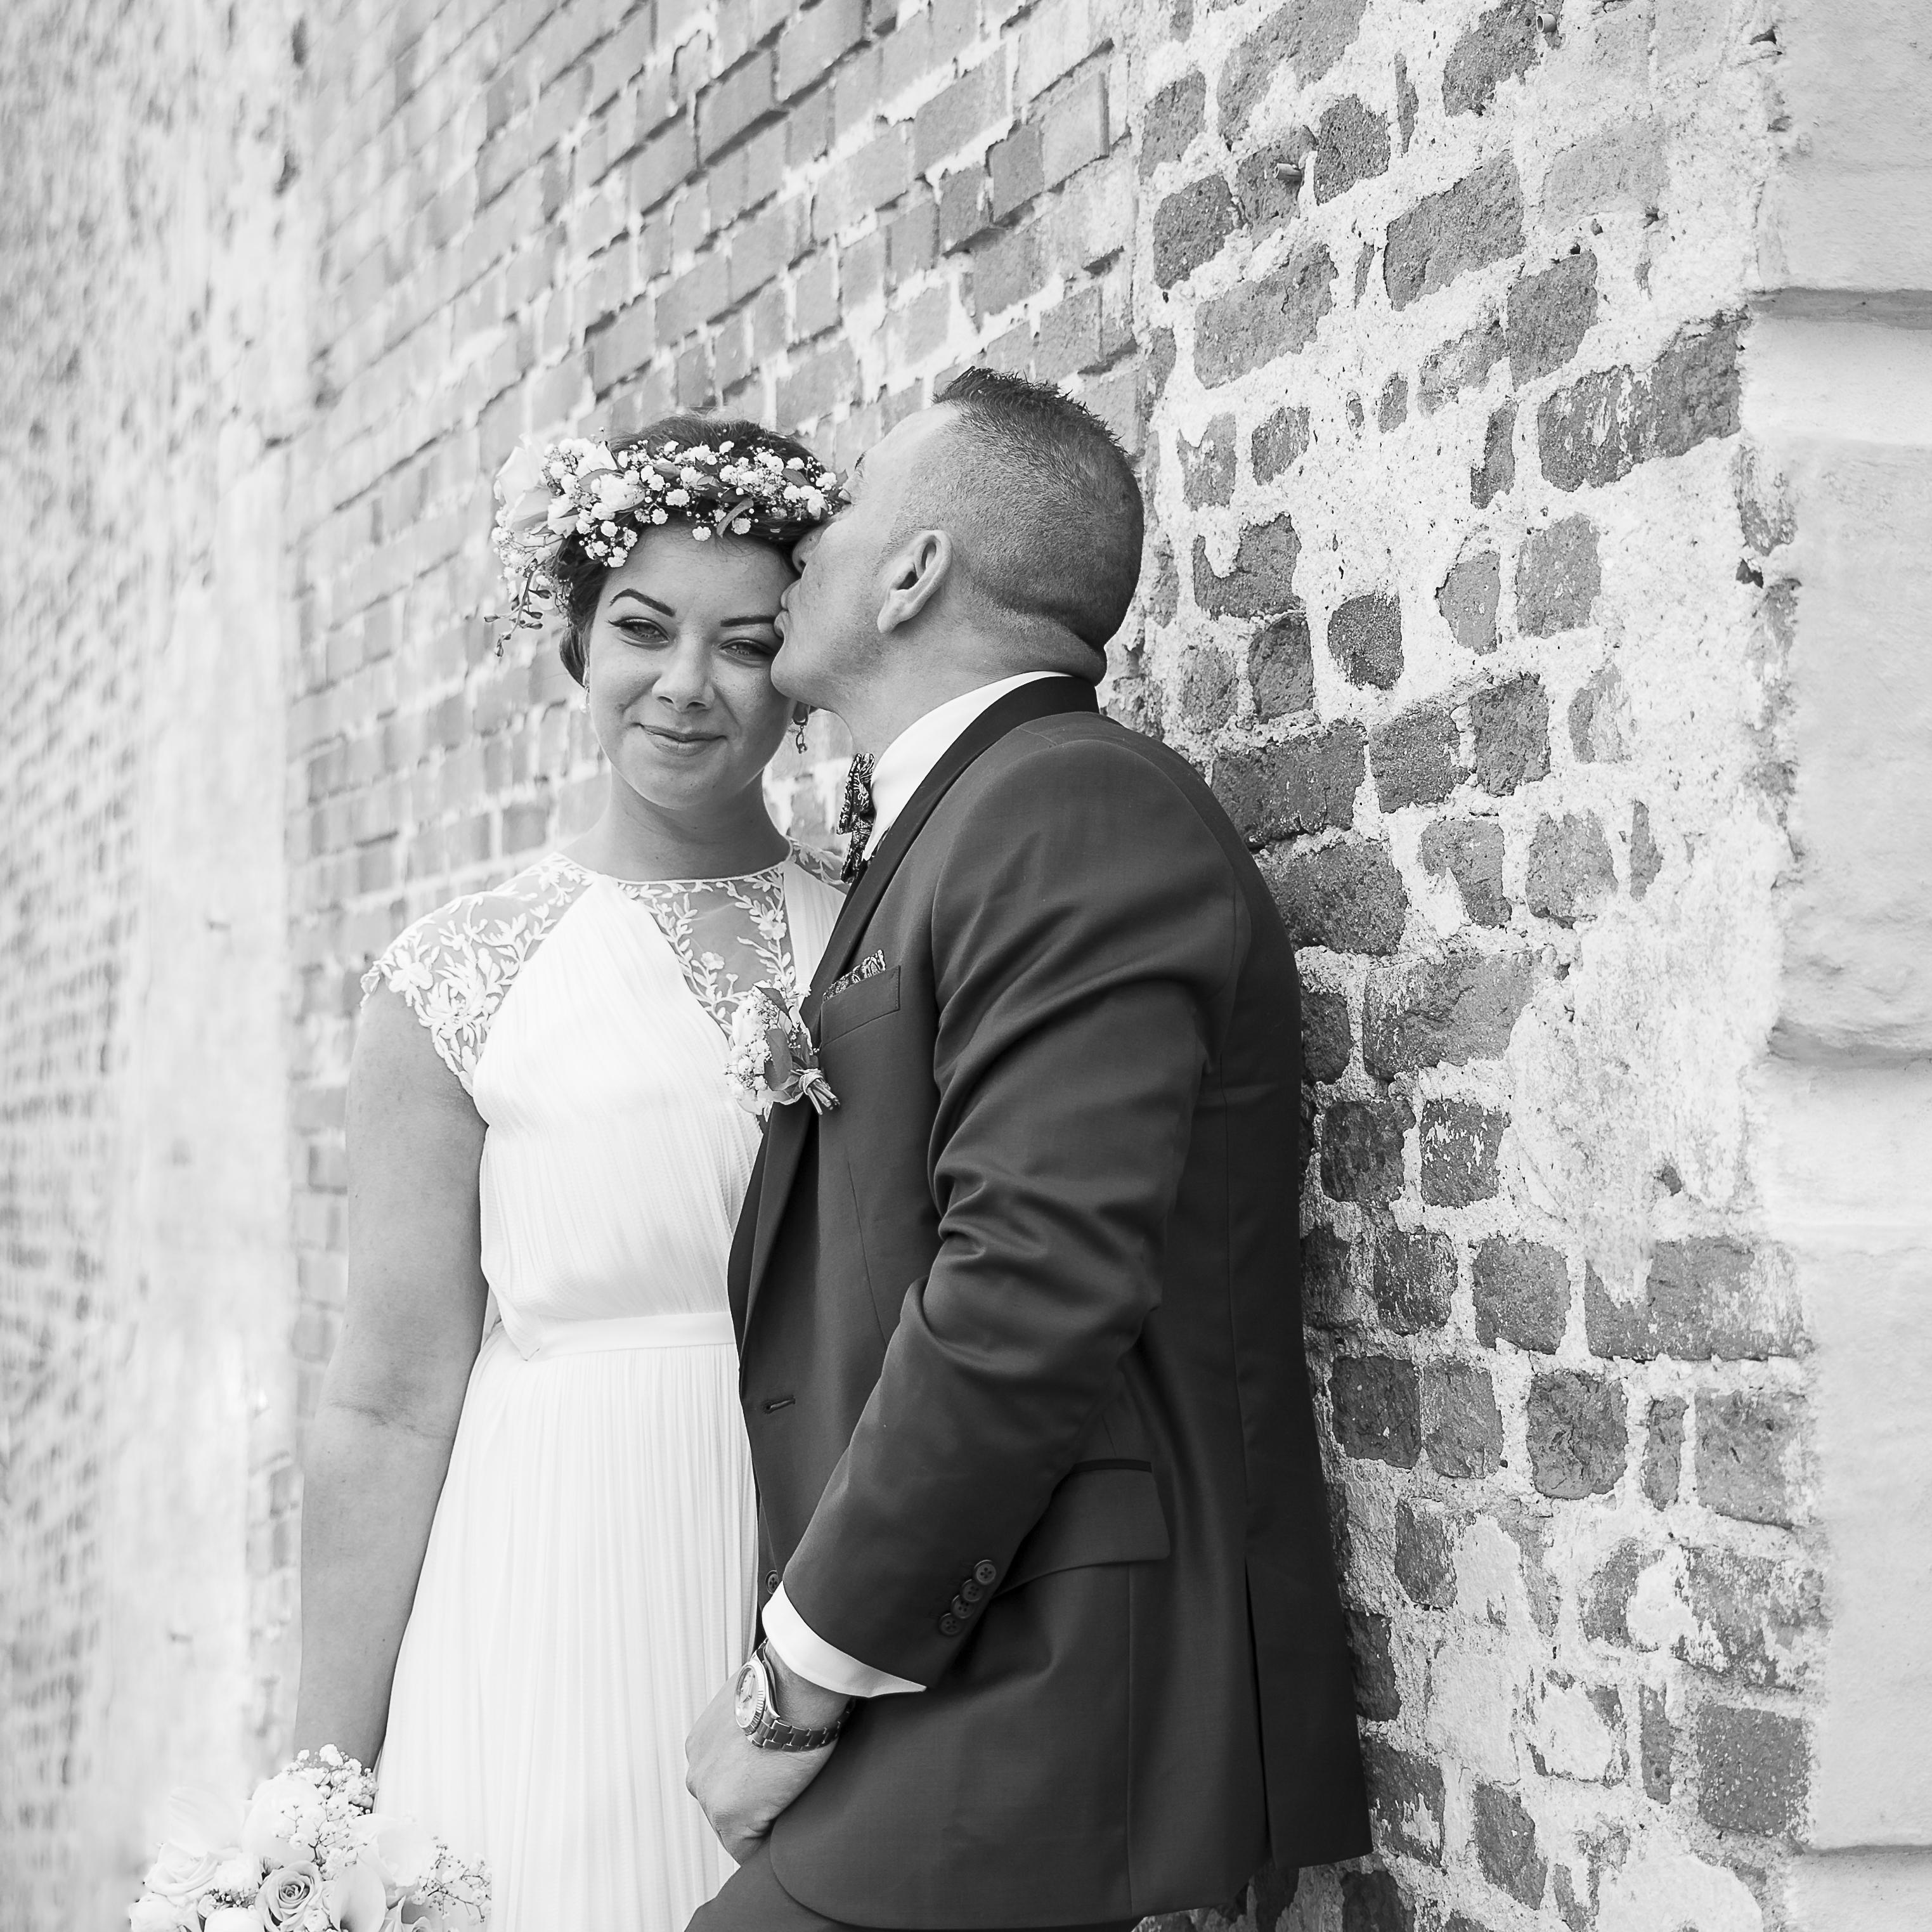 Pinkstudio by Angelina Devine 171A4308 Bryllupsfotografering til 2500 kr